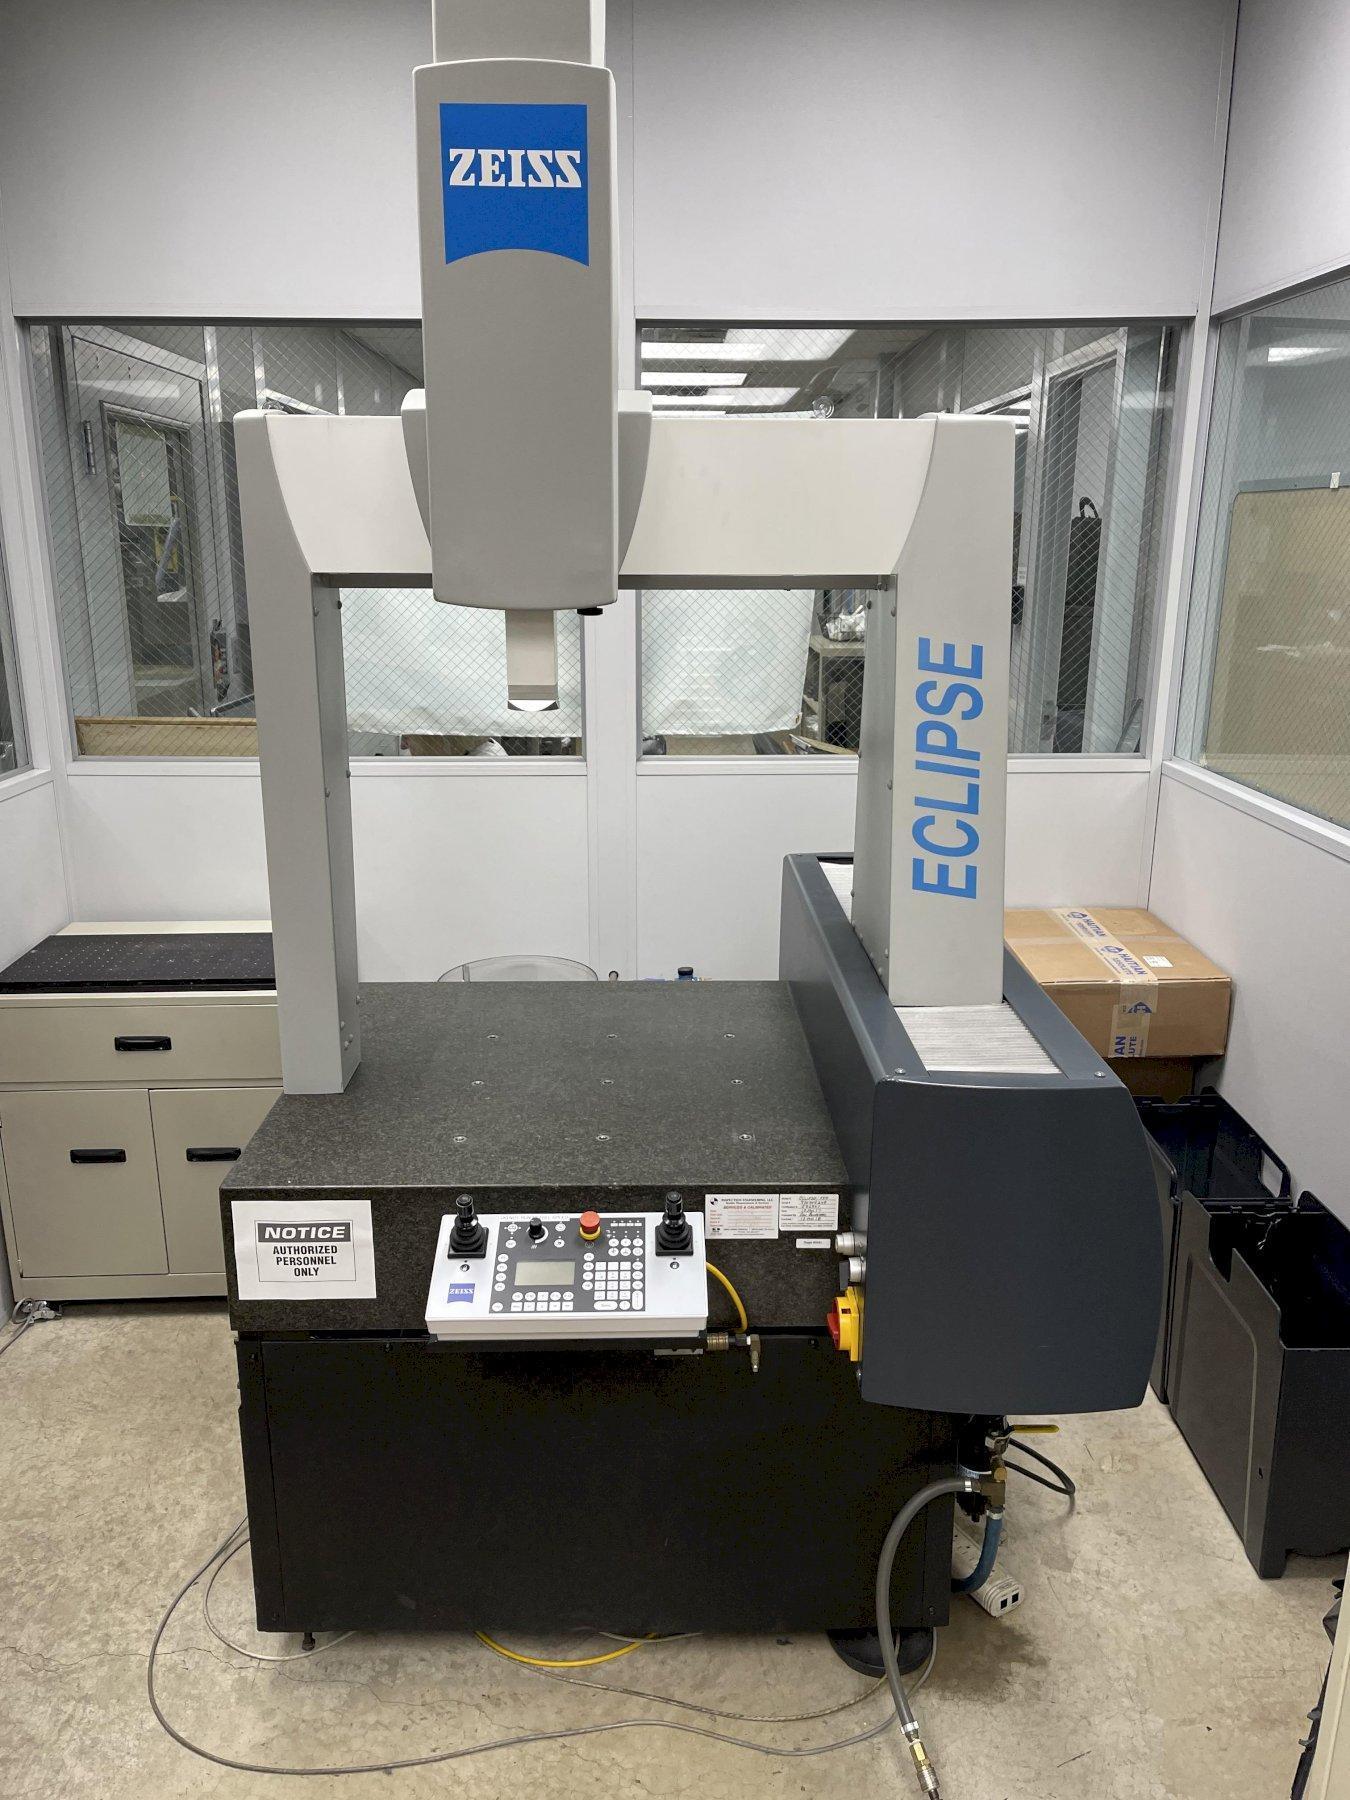 Zeiss Eclipse 550 Coordinate Measuring Machine (CMM)(#33222)